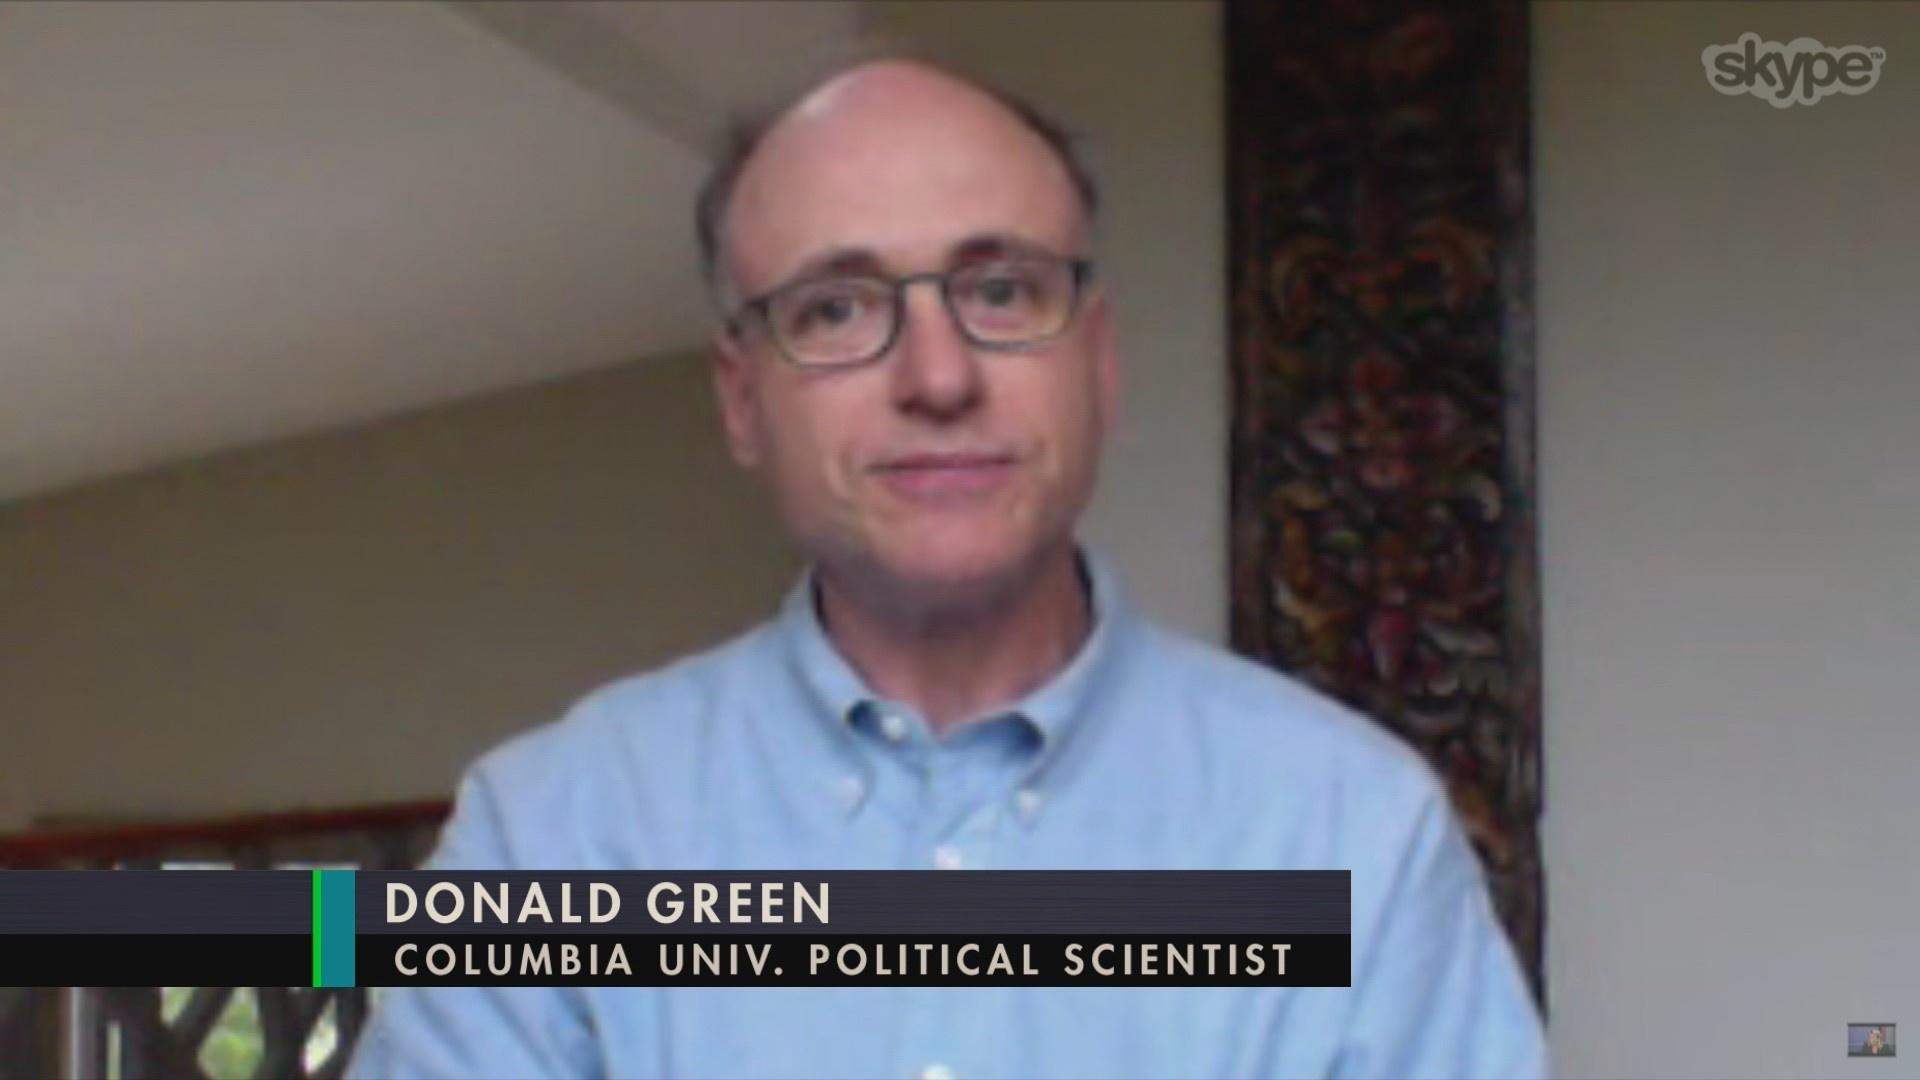 Professor Donald Green Discusses Voter Turnout